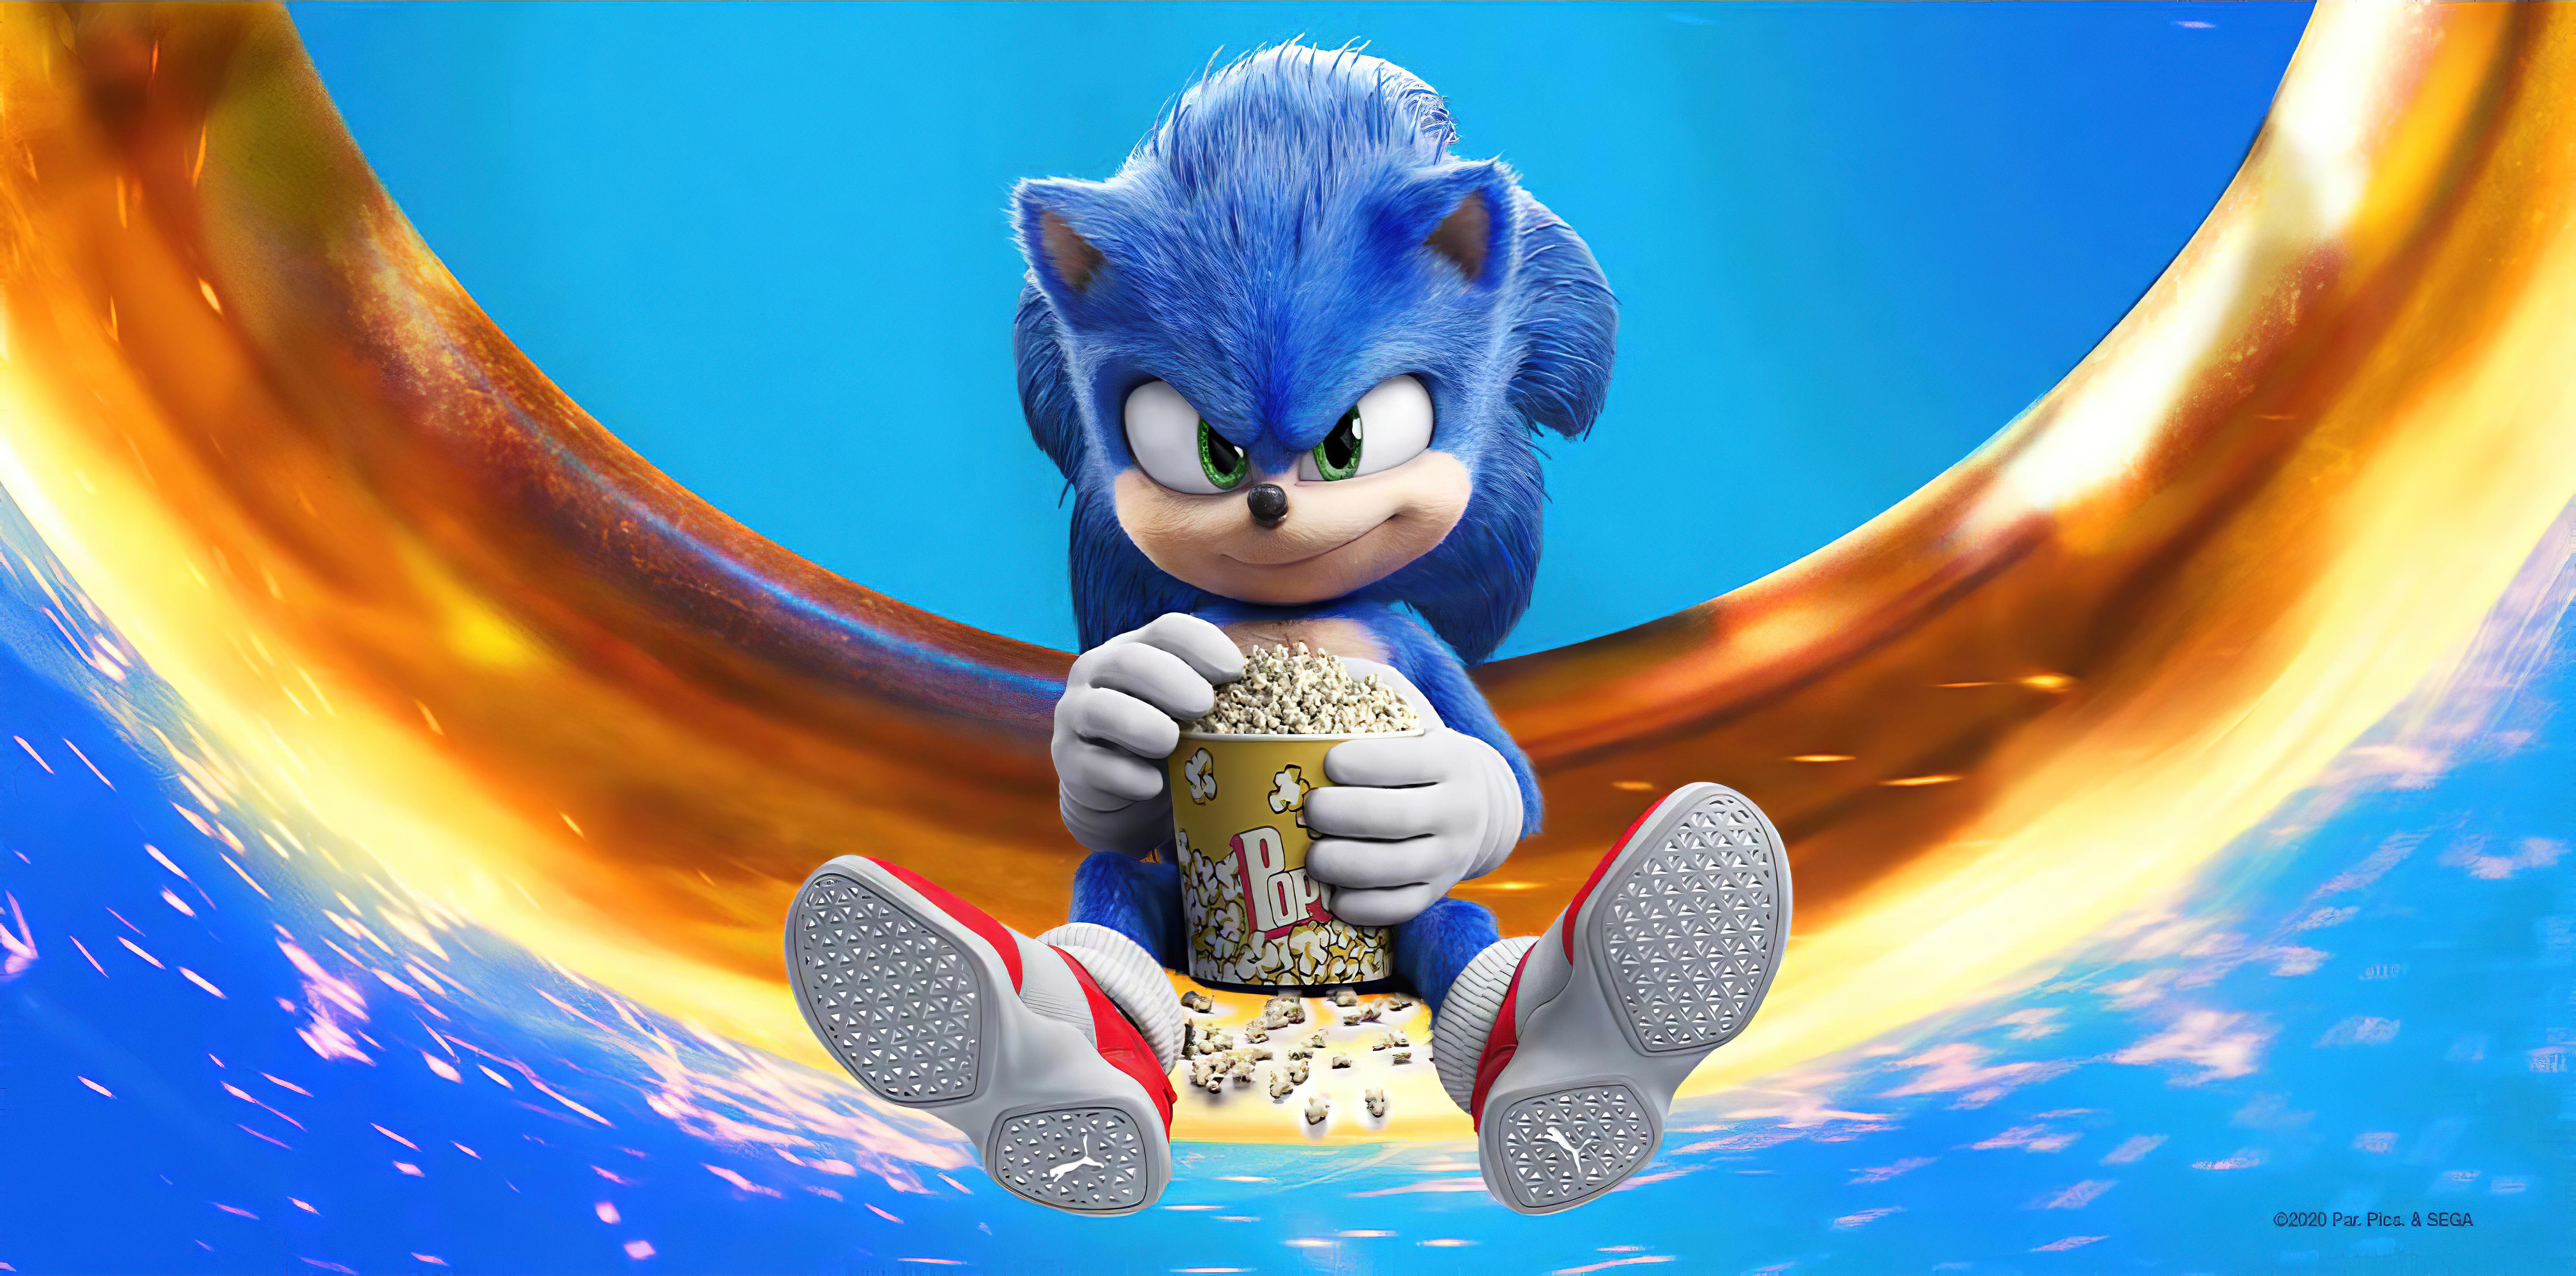 sonic the hedgehog movie wallpaper